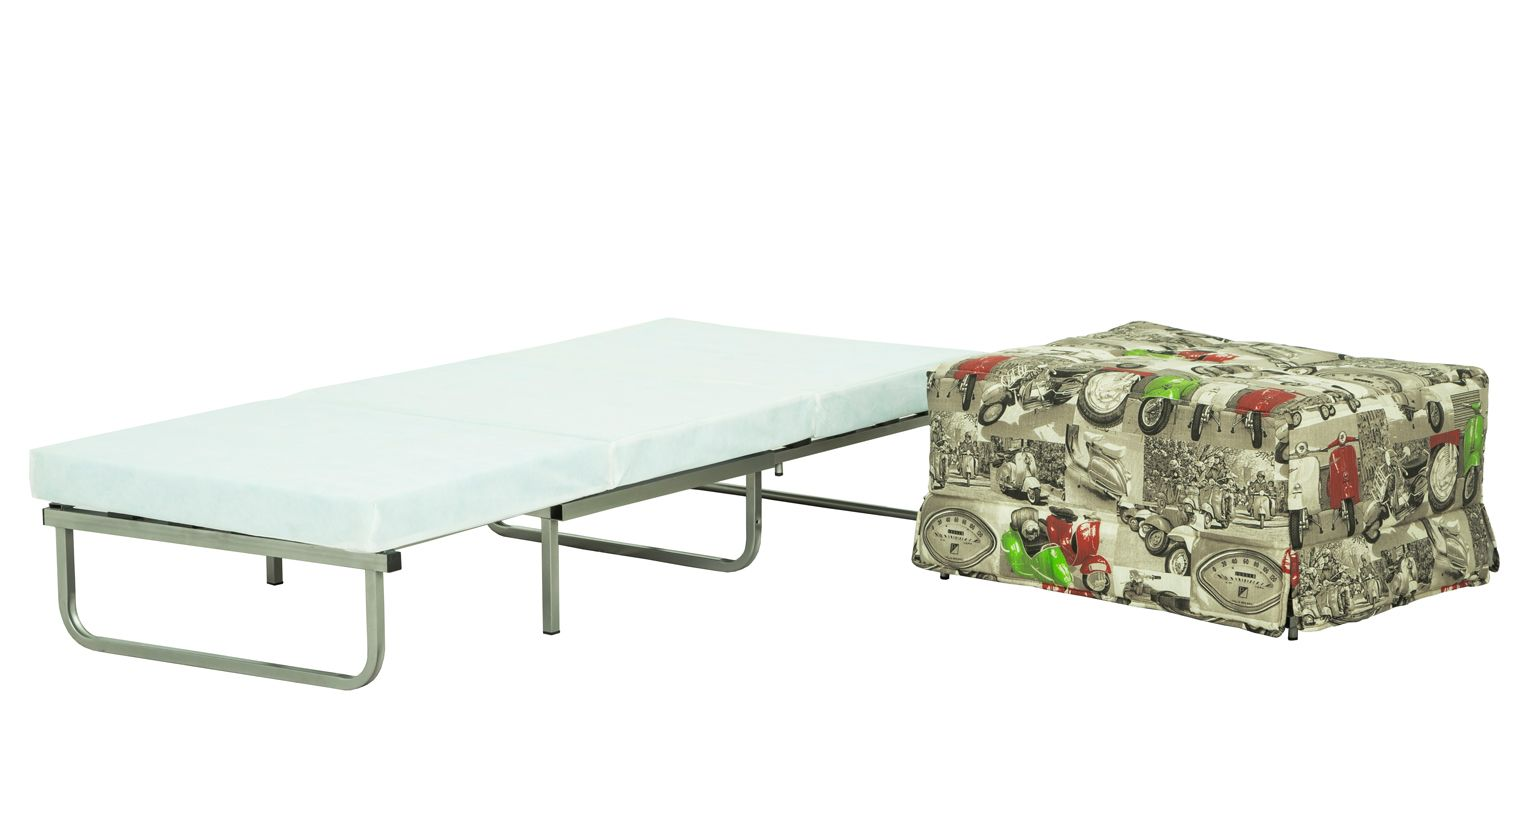 Comprar puff confort puff cama 80x180 loneta estampada for Cama 80x180